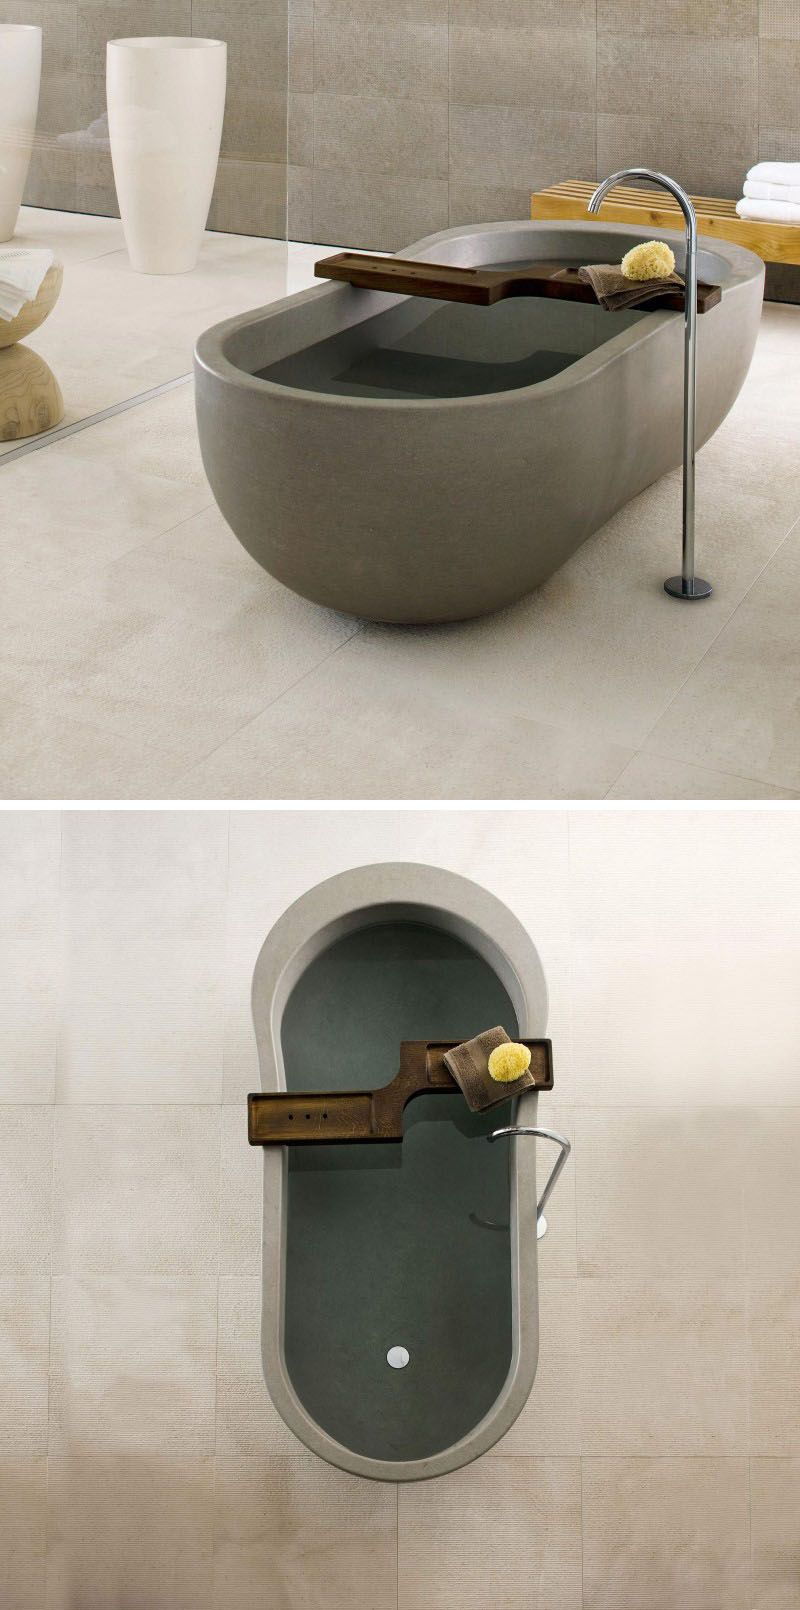 double marble stone polished slipper vespasian tub bathtubs carrara modern bathtub